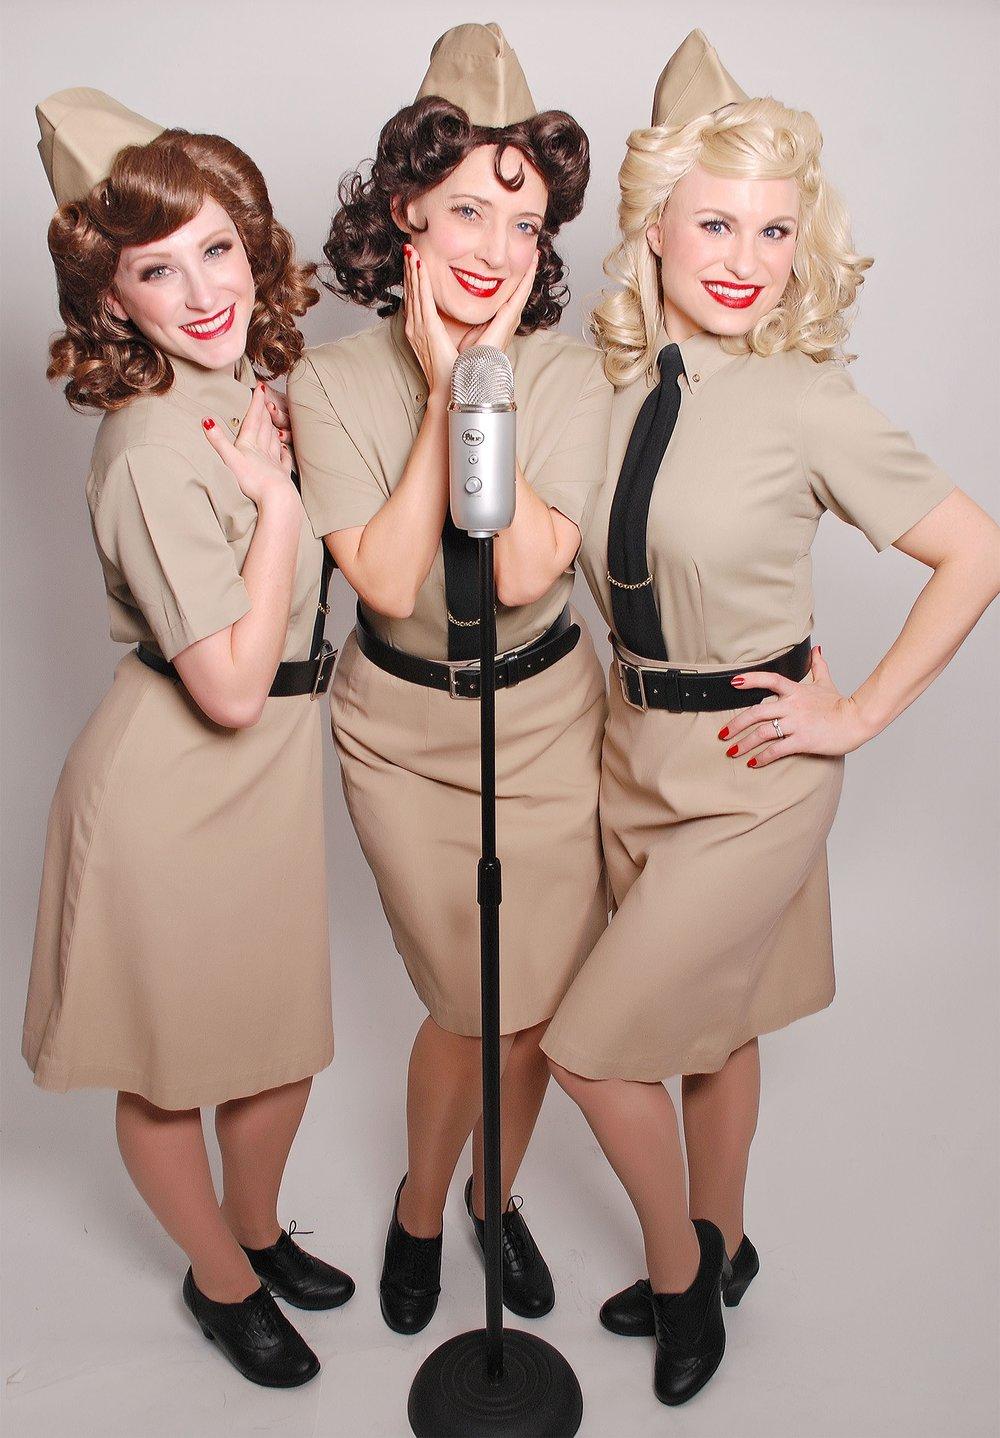 The Swing Dolls Vintage Singing Trio